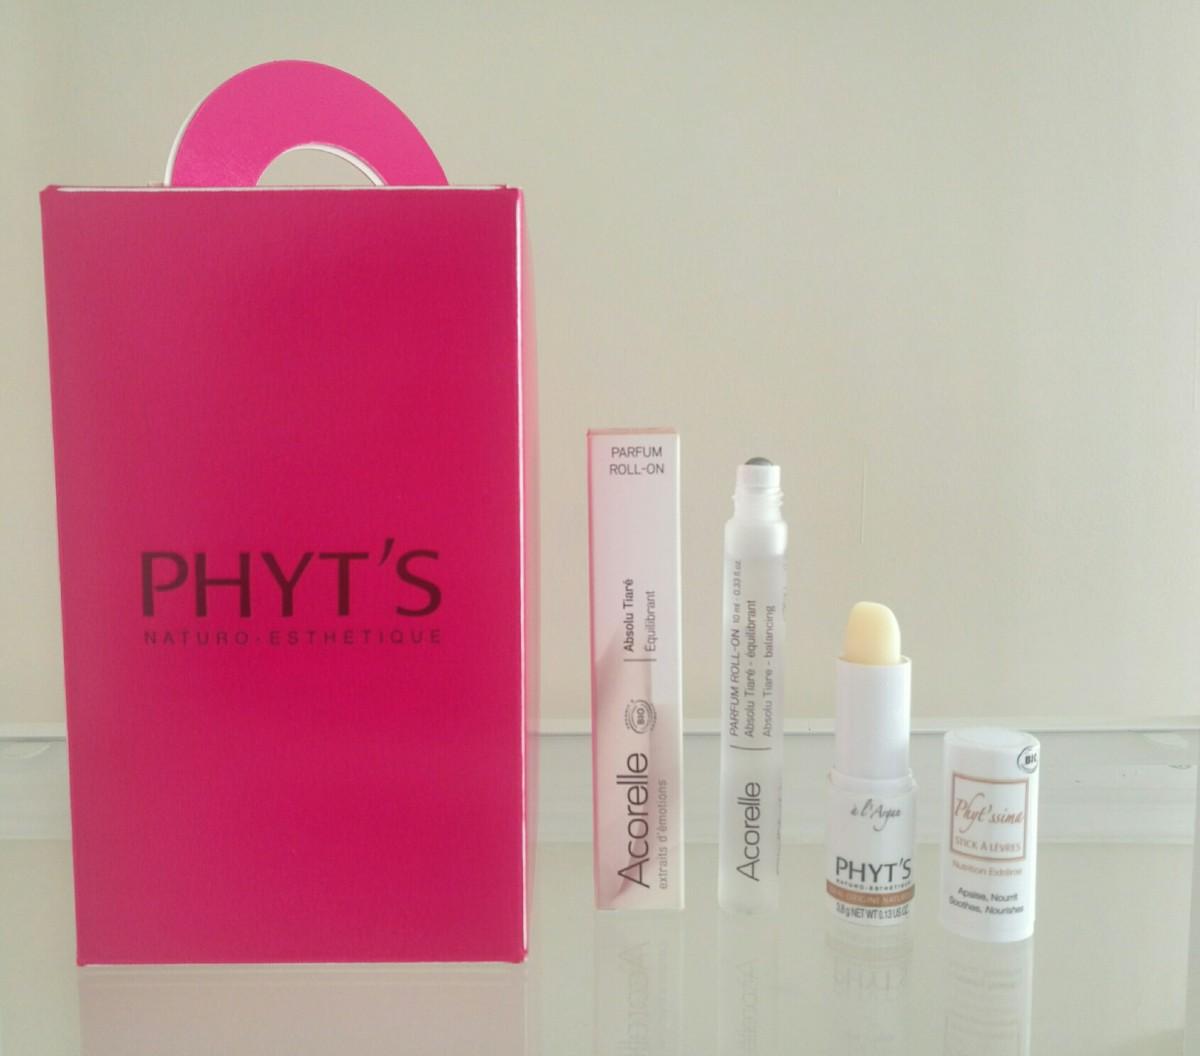 Acorelle Perfume   Phyt s Hydrating Lip Balm Gift Set - Marie ... 038f069f989